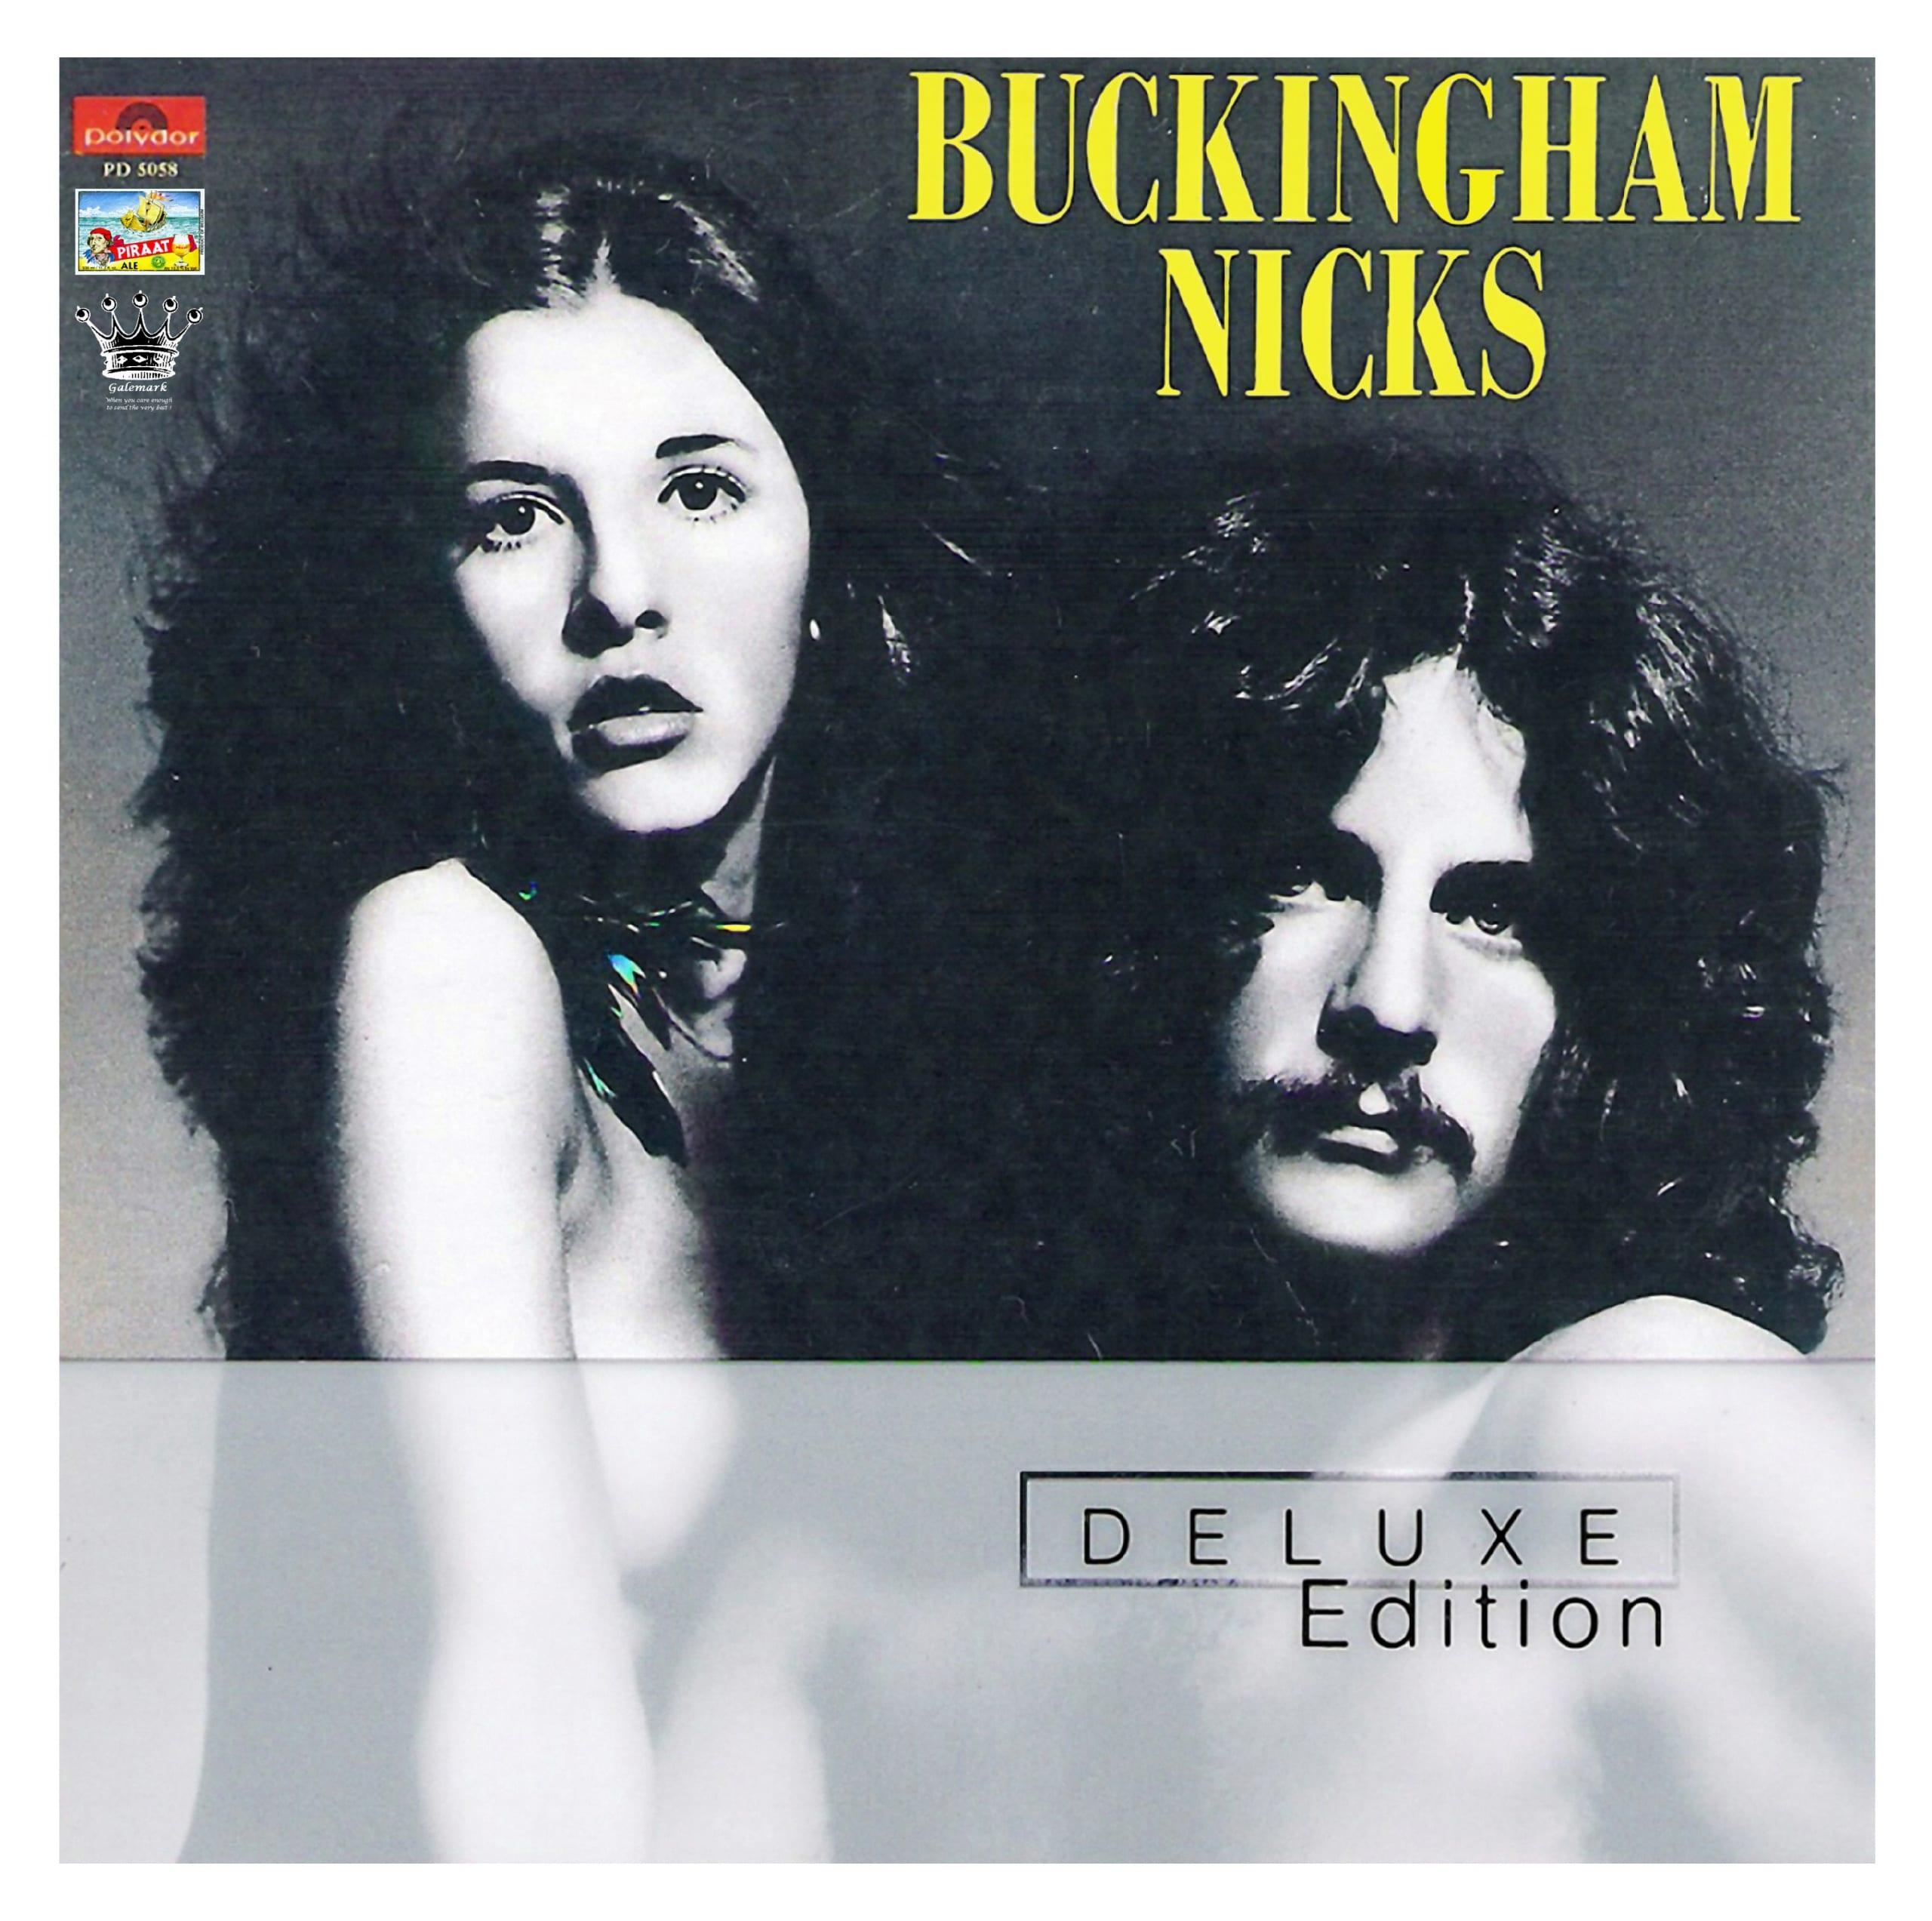 Buckingham Nicks